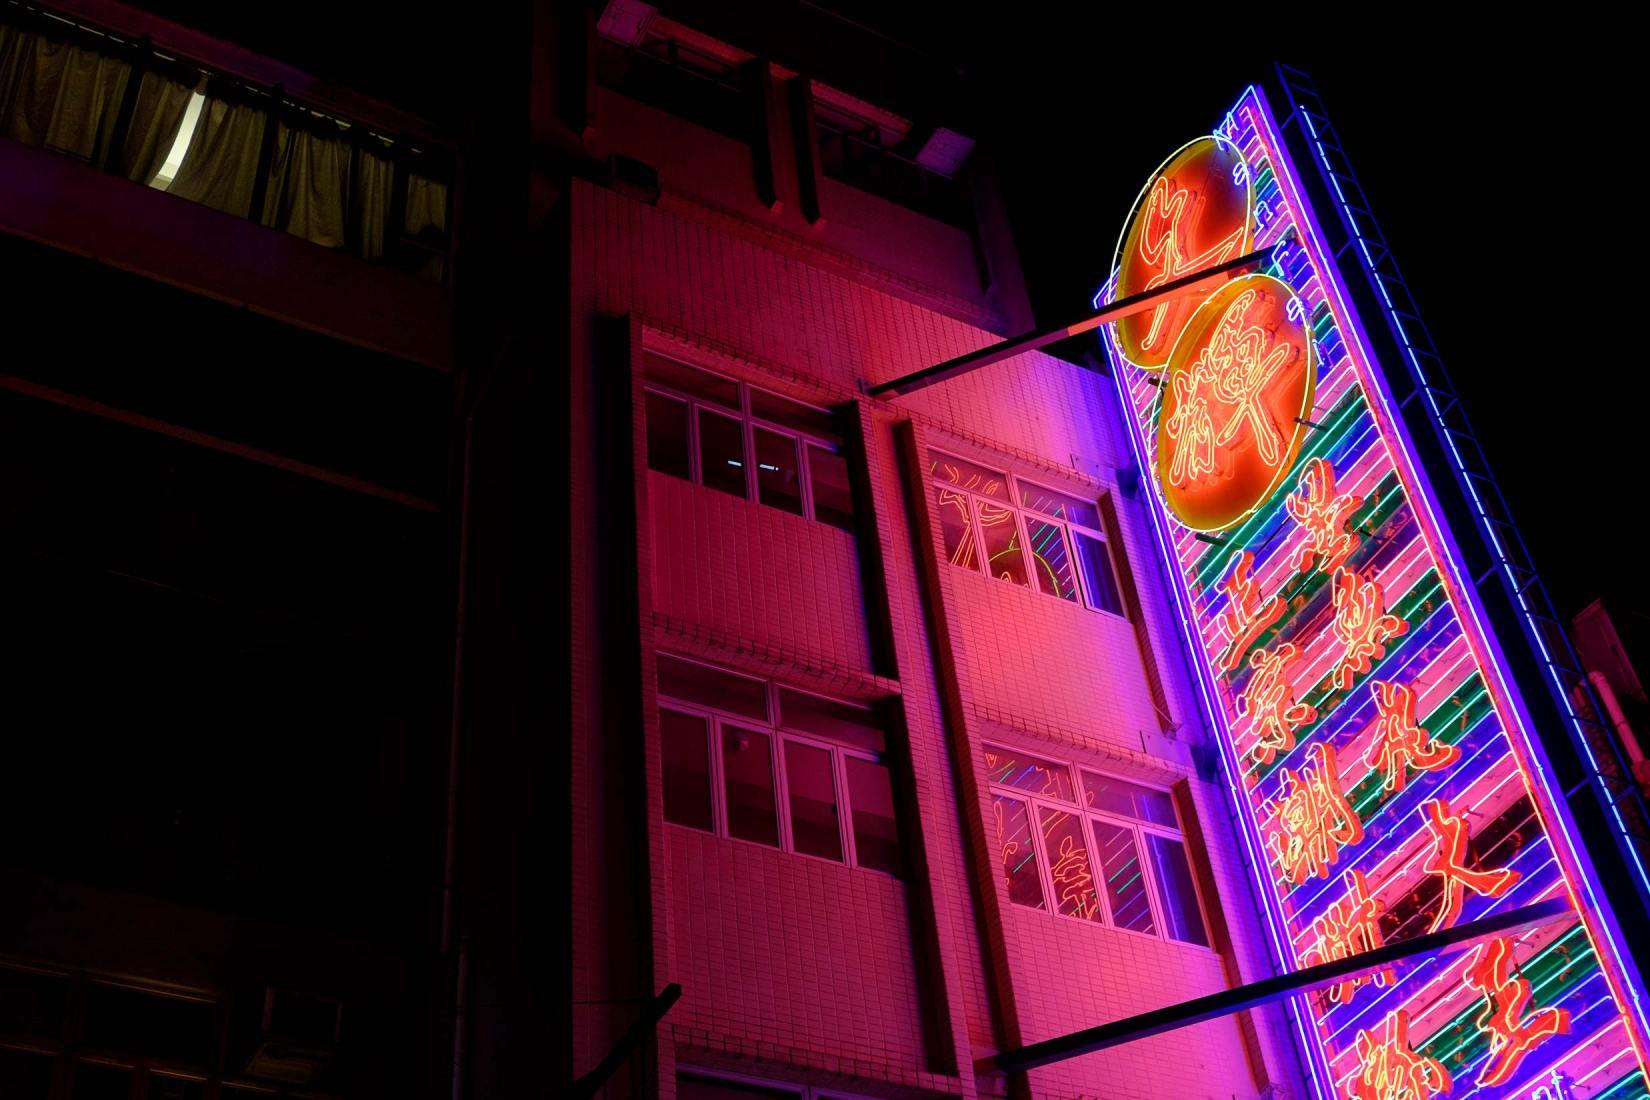 PWS020-0286-Sharon-Blance-Melbourne-photographer-Hong-Kong-neon